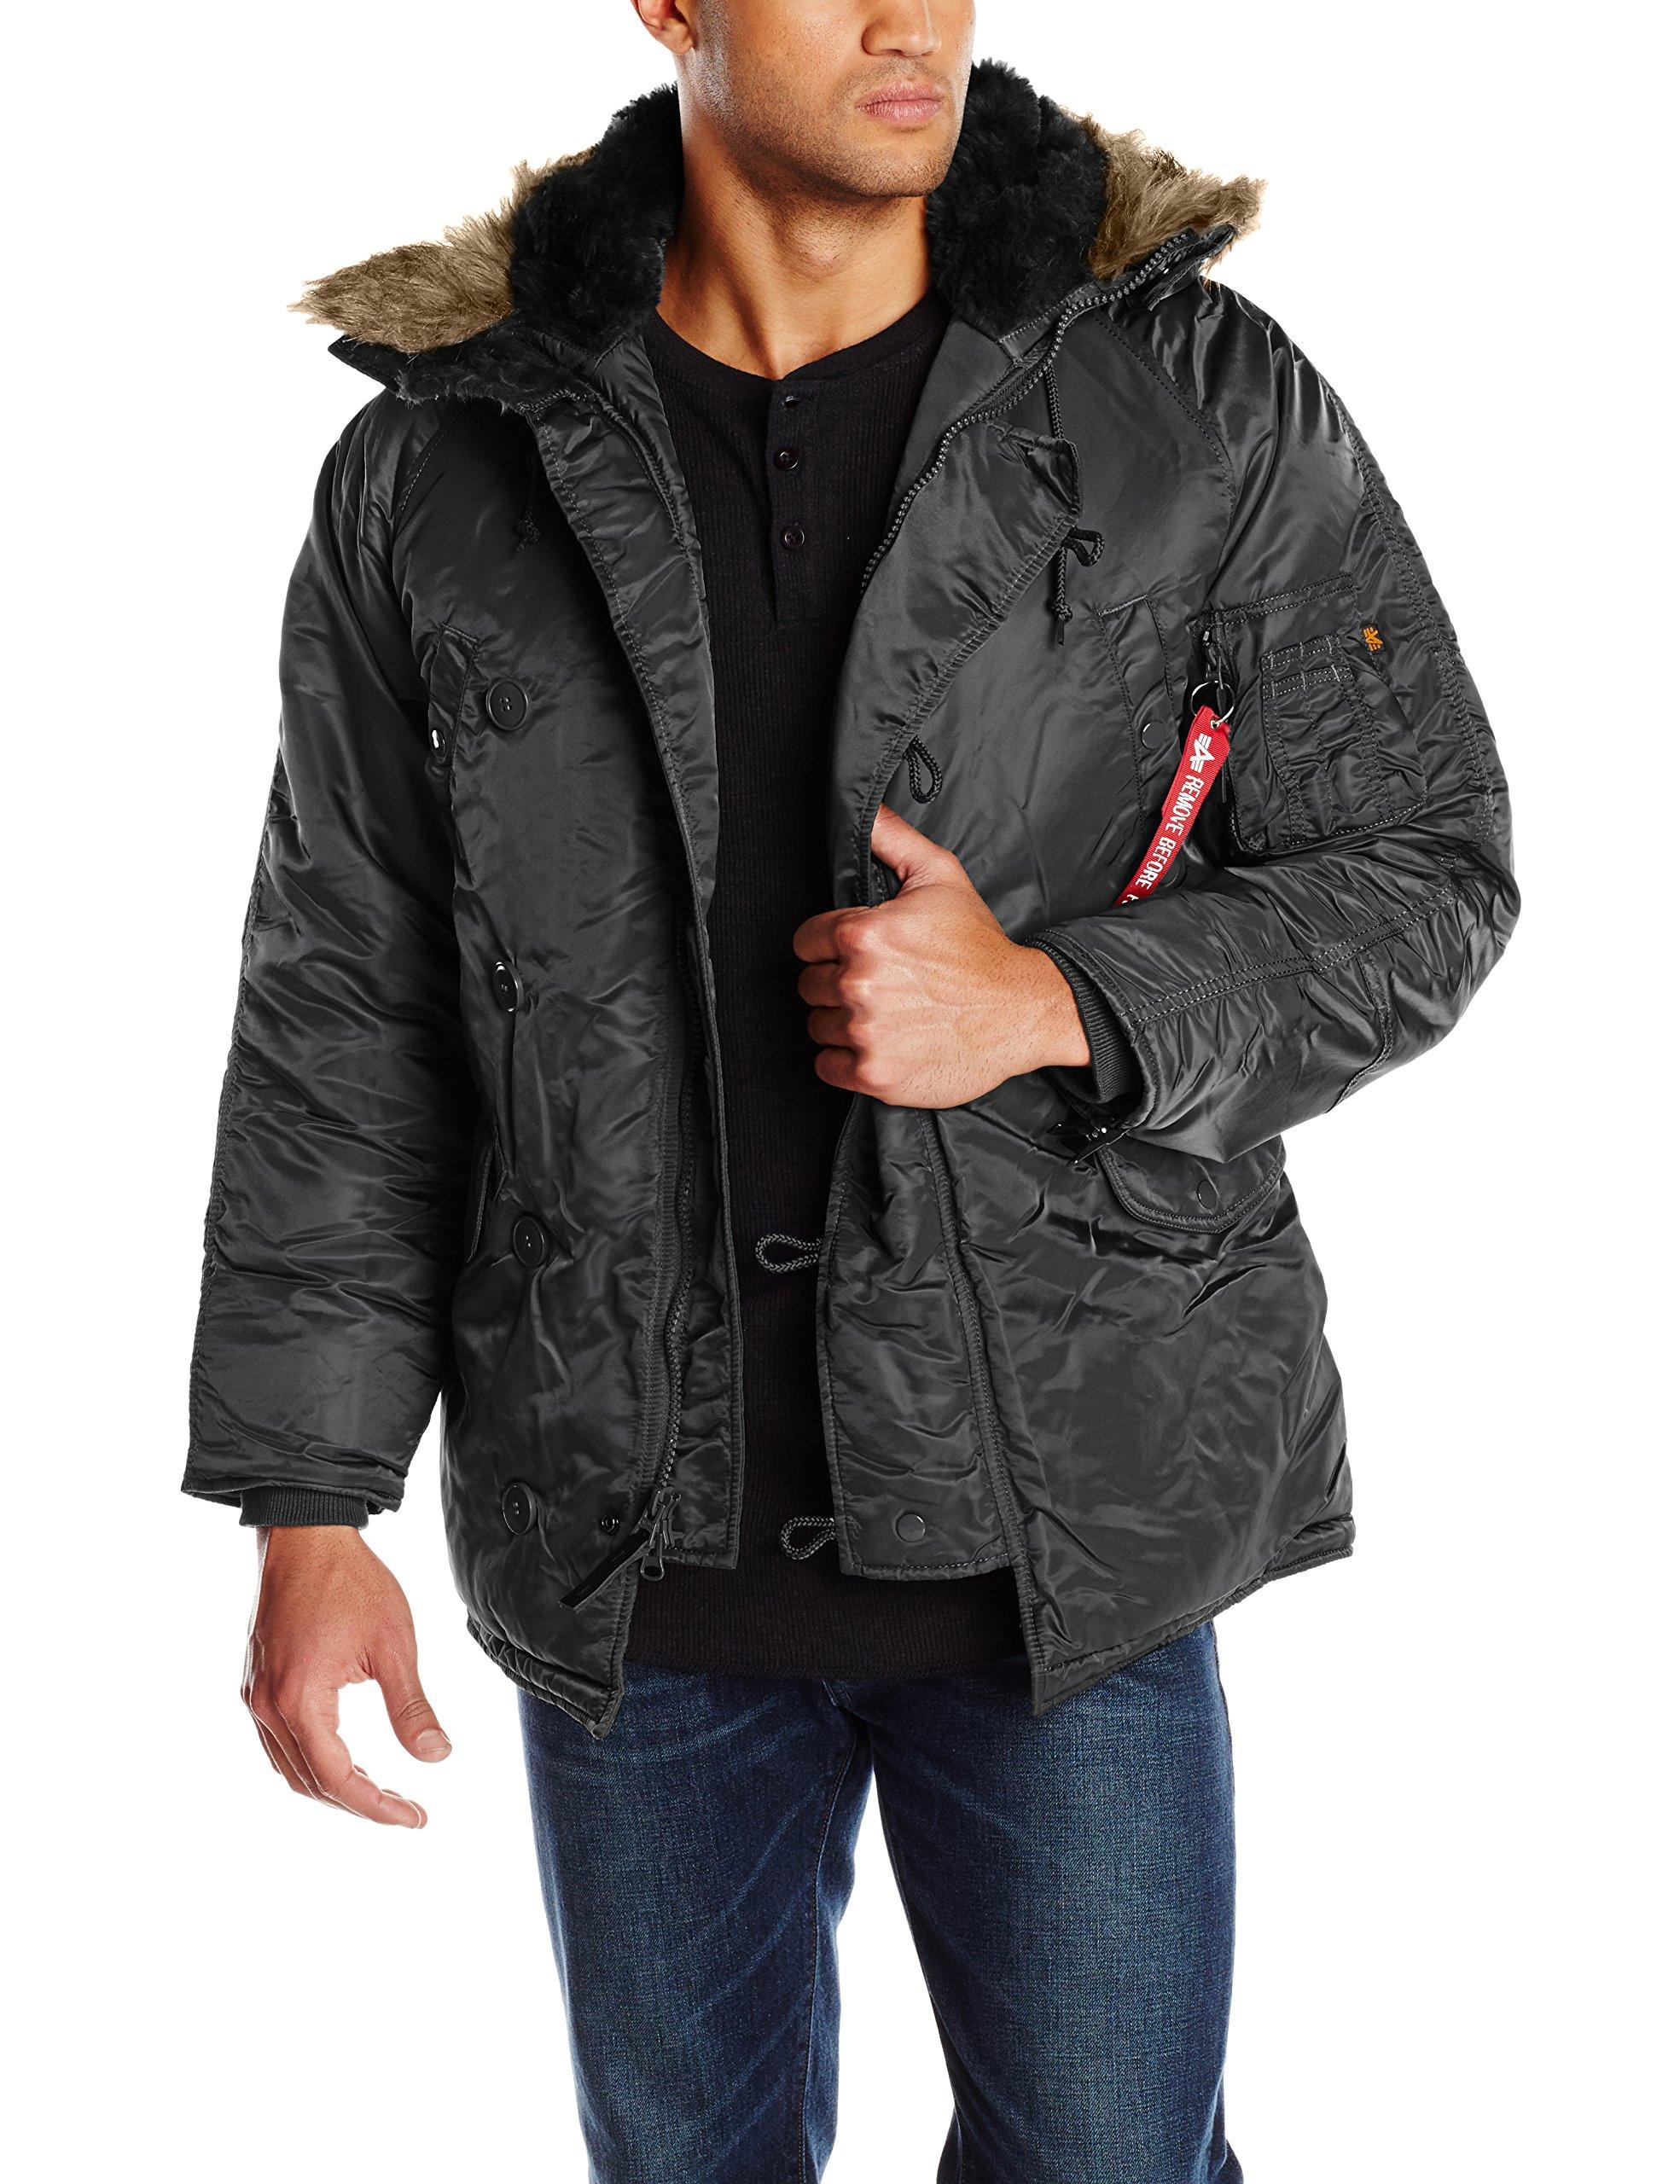 Alpha Industries Men's N-3B Parka Jacket, Black, 4X-Large